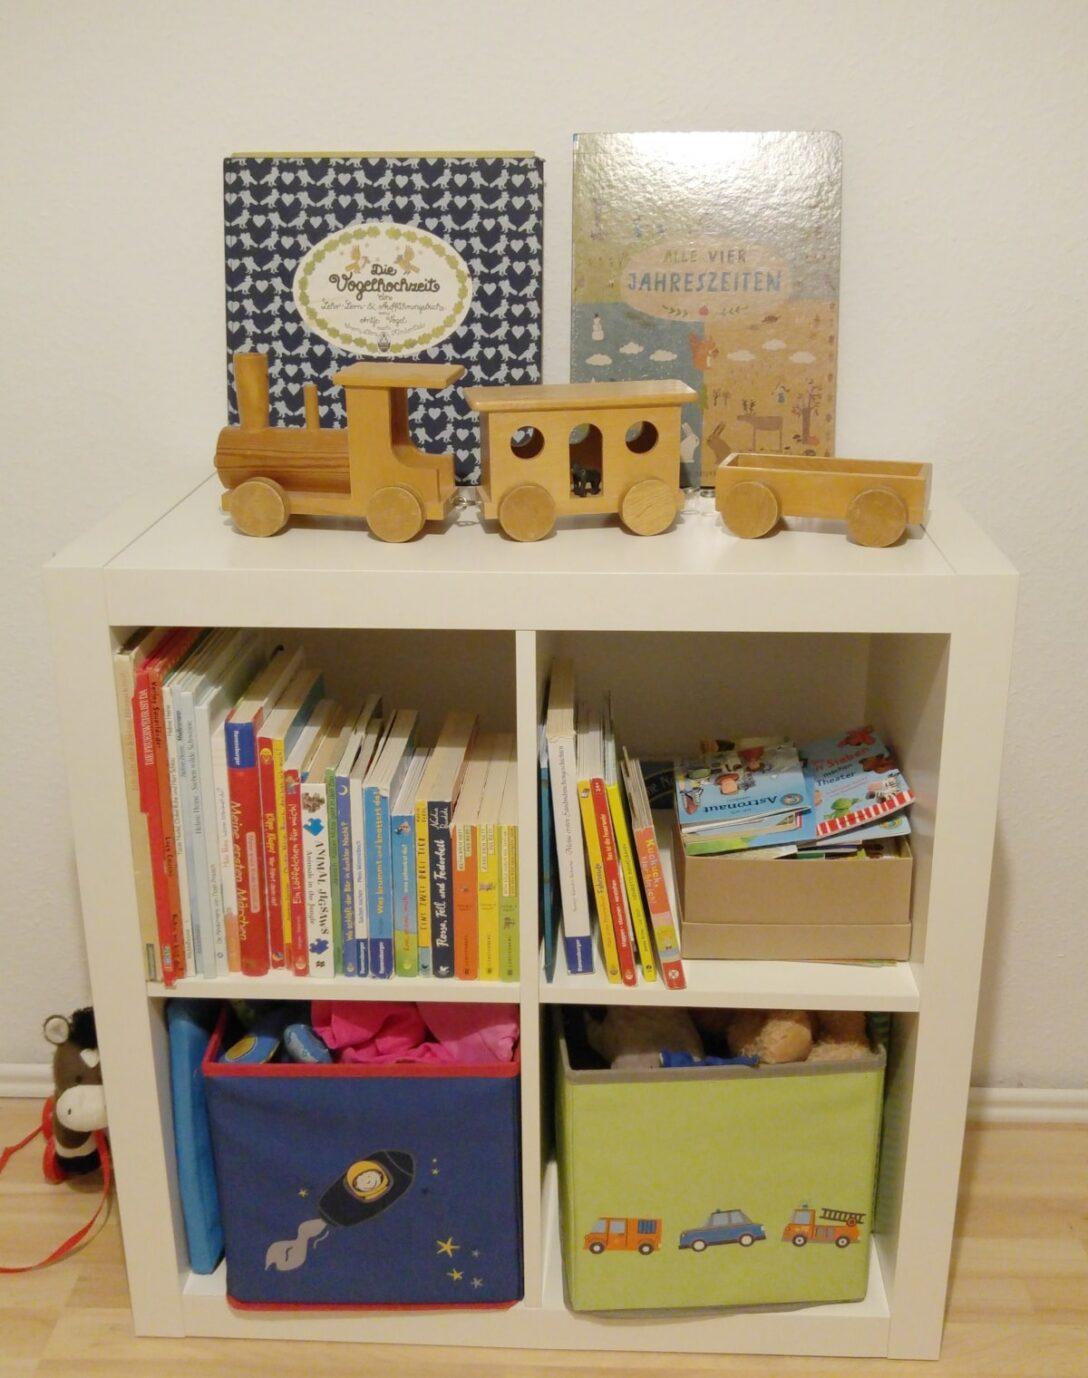 Large Size of Bücherregal Kinderzimmer Sofa Regal Regale Weiß Kinderzimmer Bücherregal Kinderzimmer